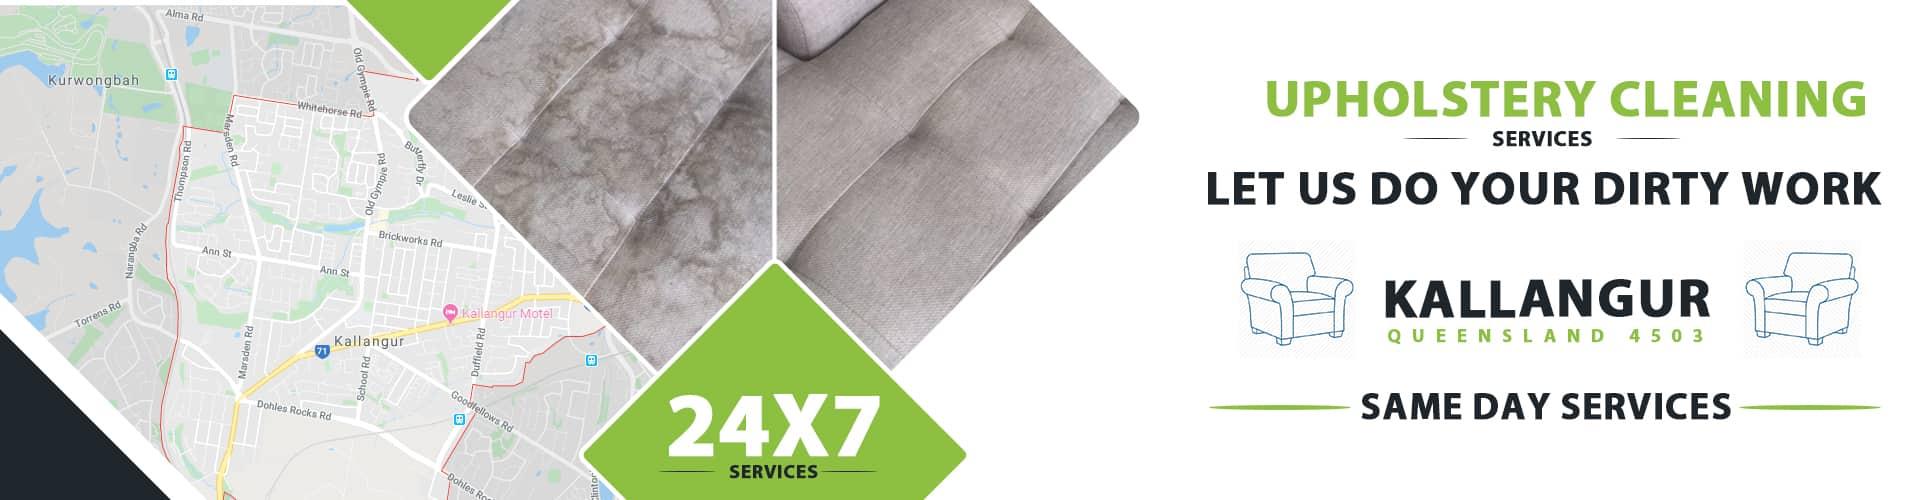 Upholstery Cleaning Kallangur